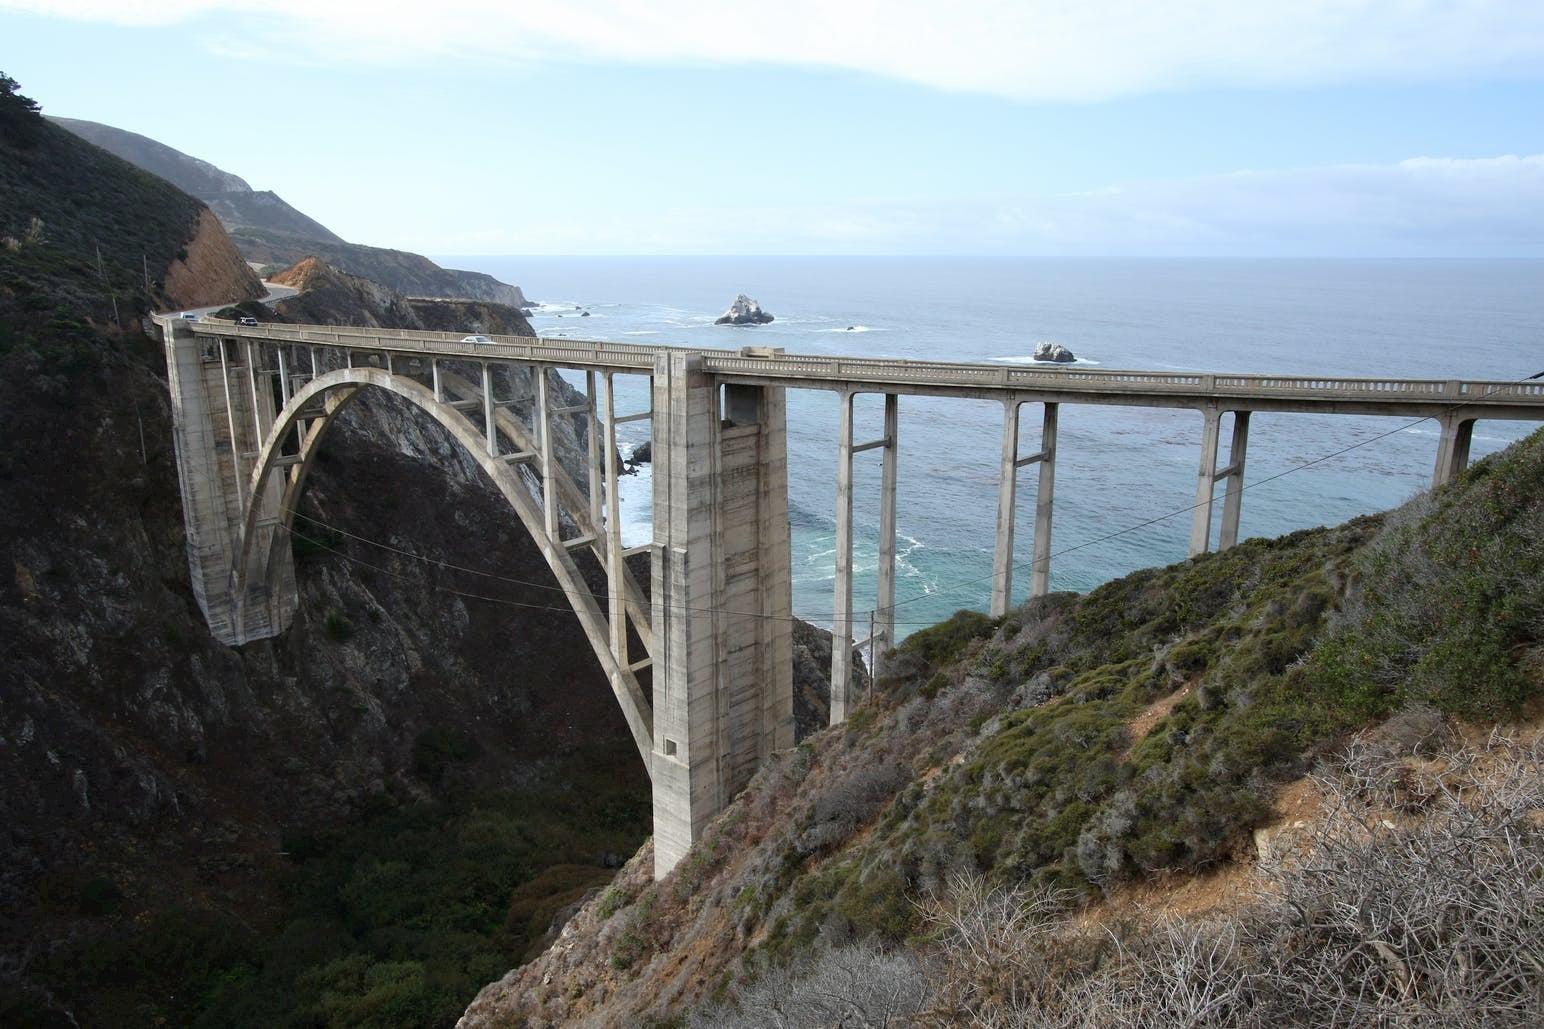 Large suspended bridge between coastal cliffs in Big Sur.